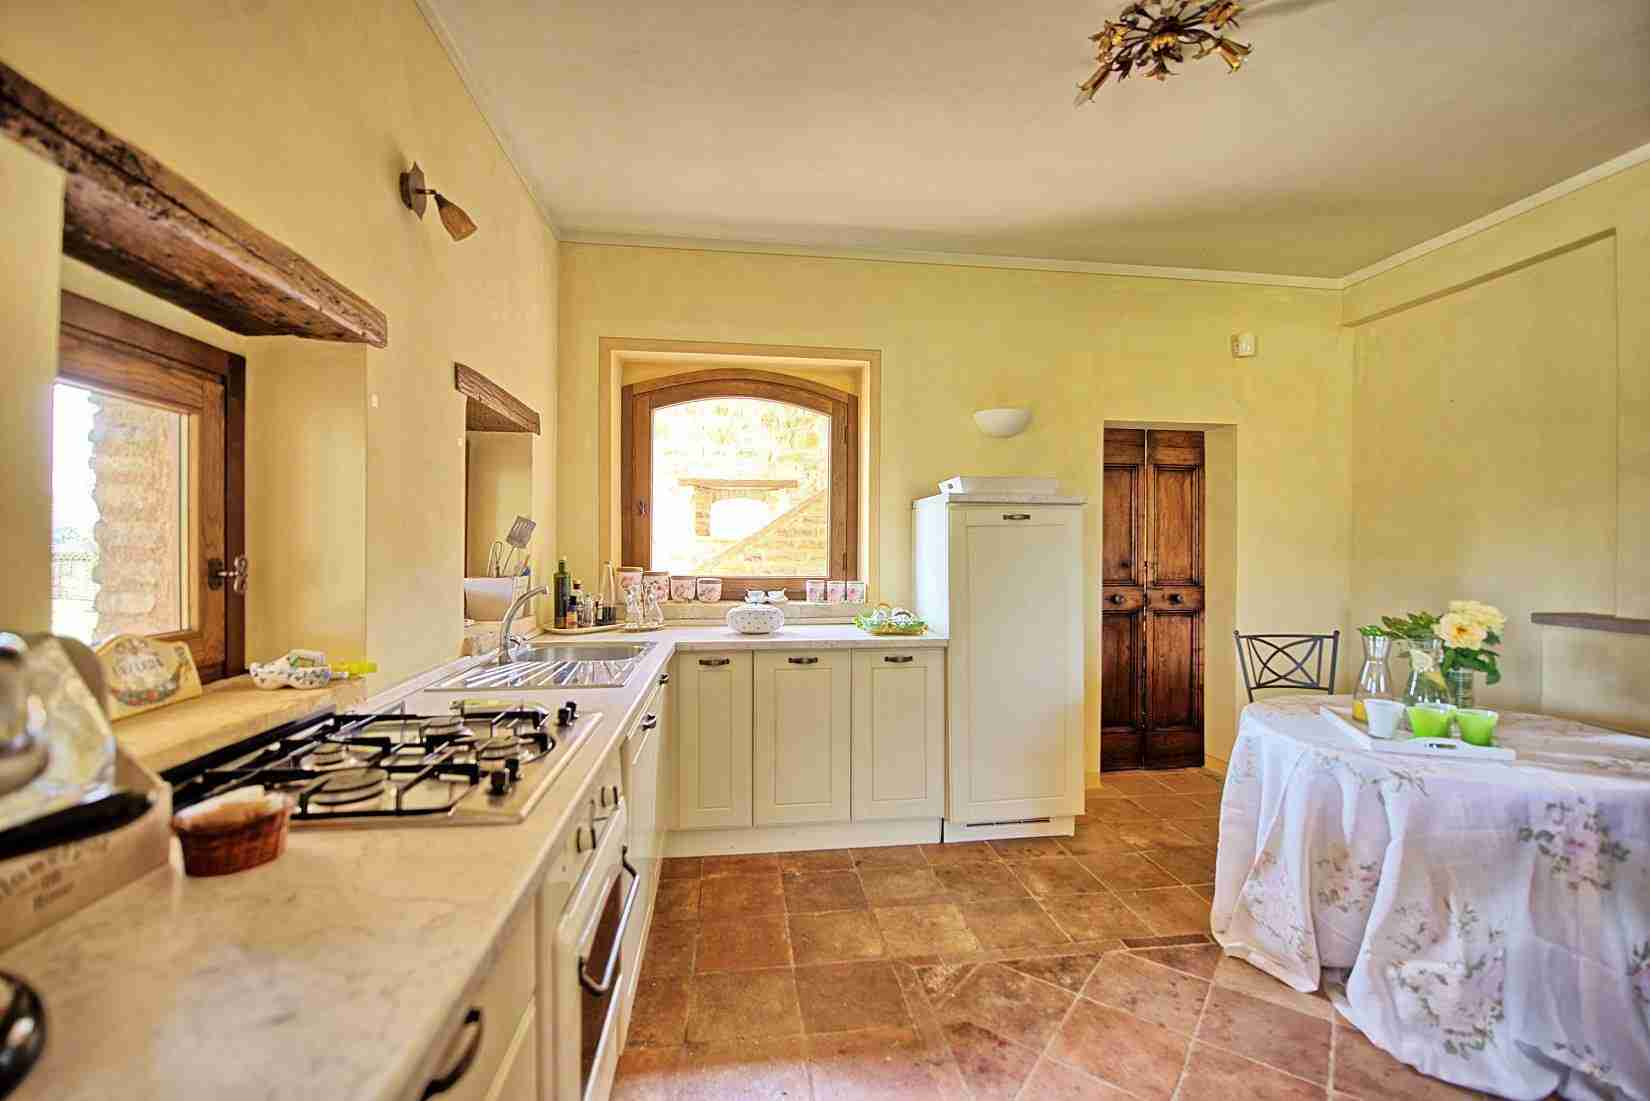 28 Assisi kitchen